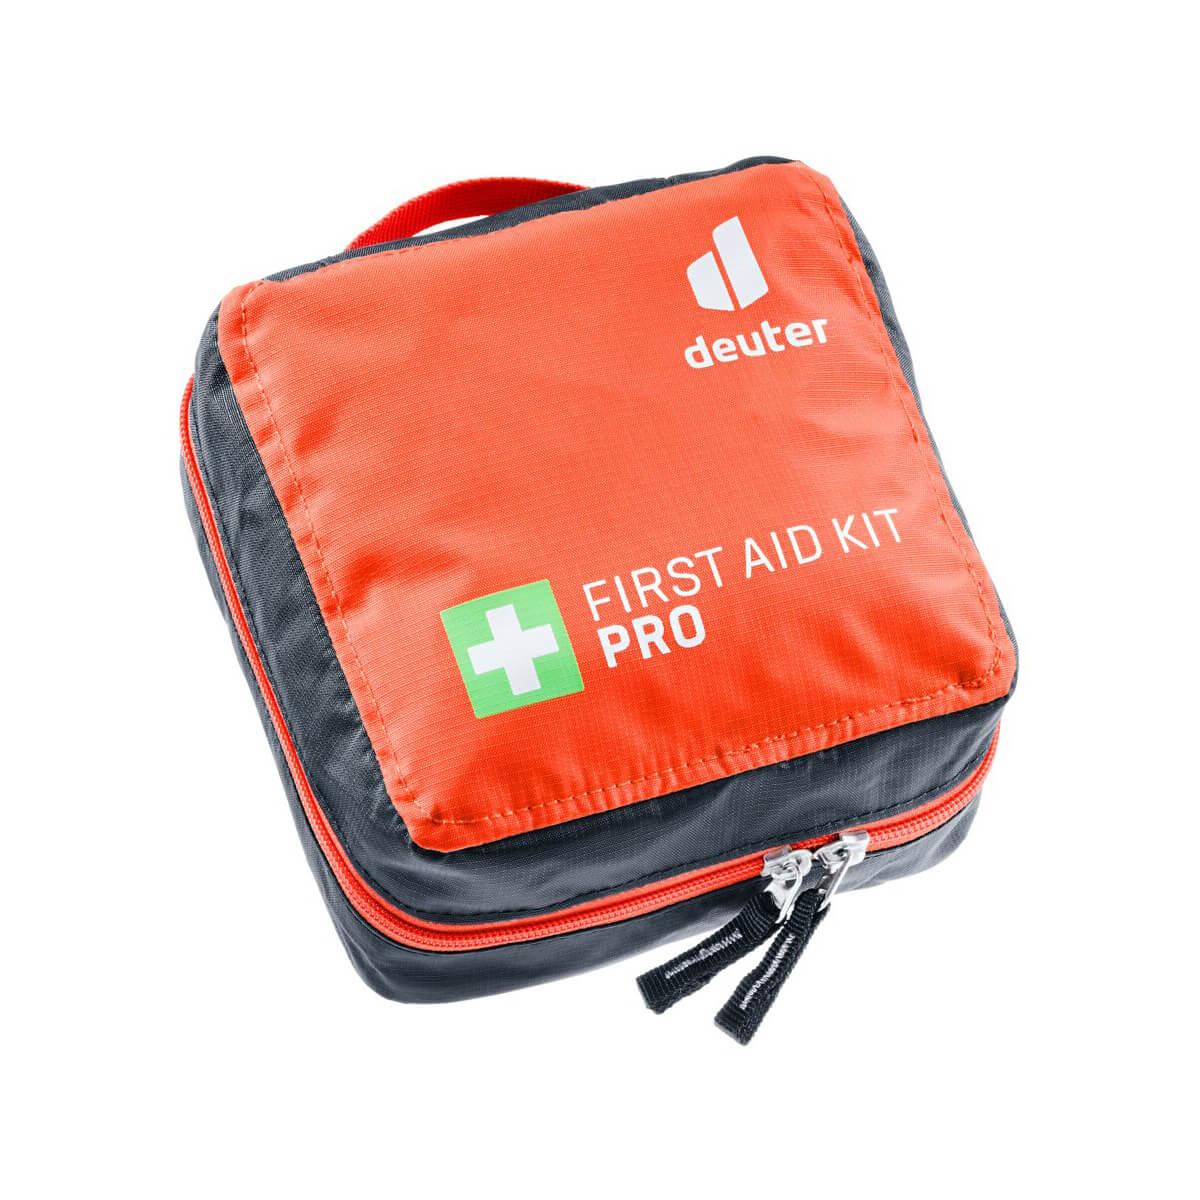 deuter-first-aid-kit-pro